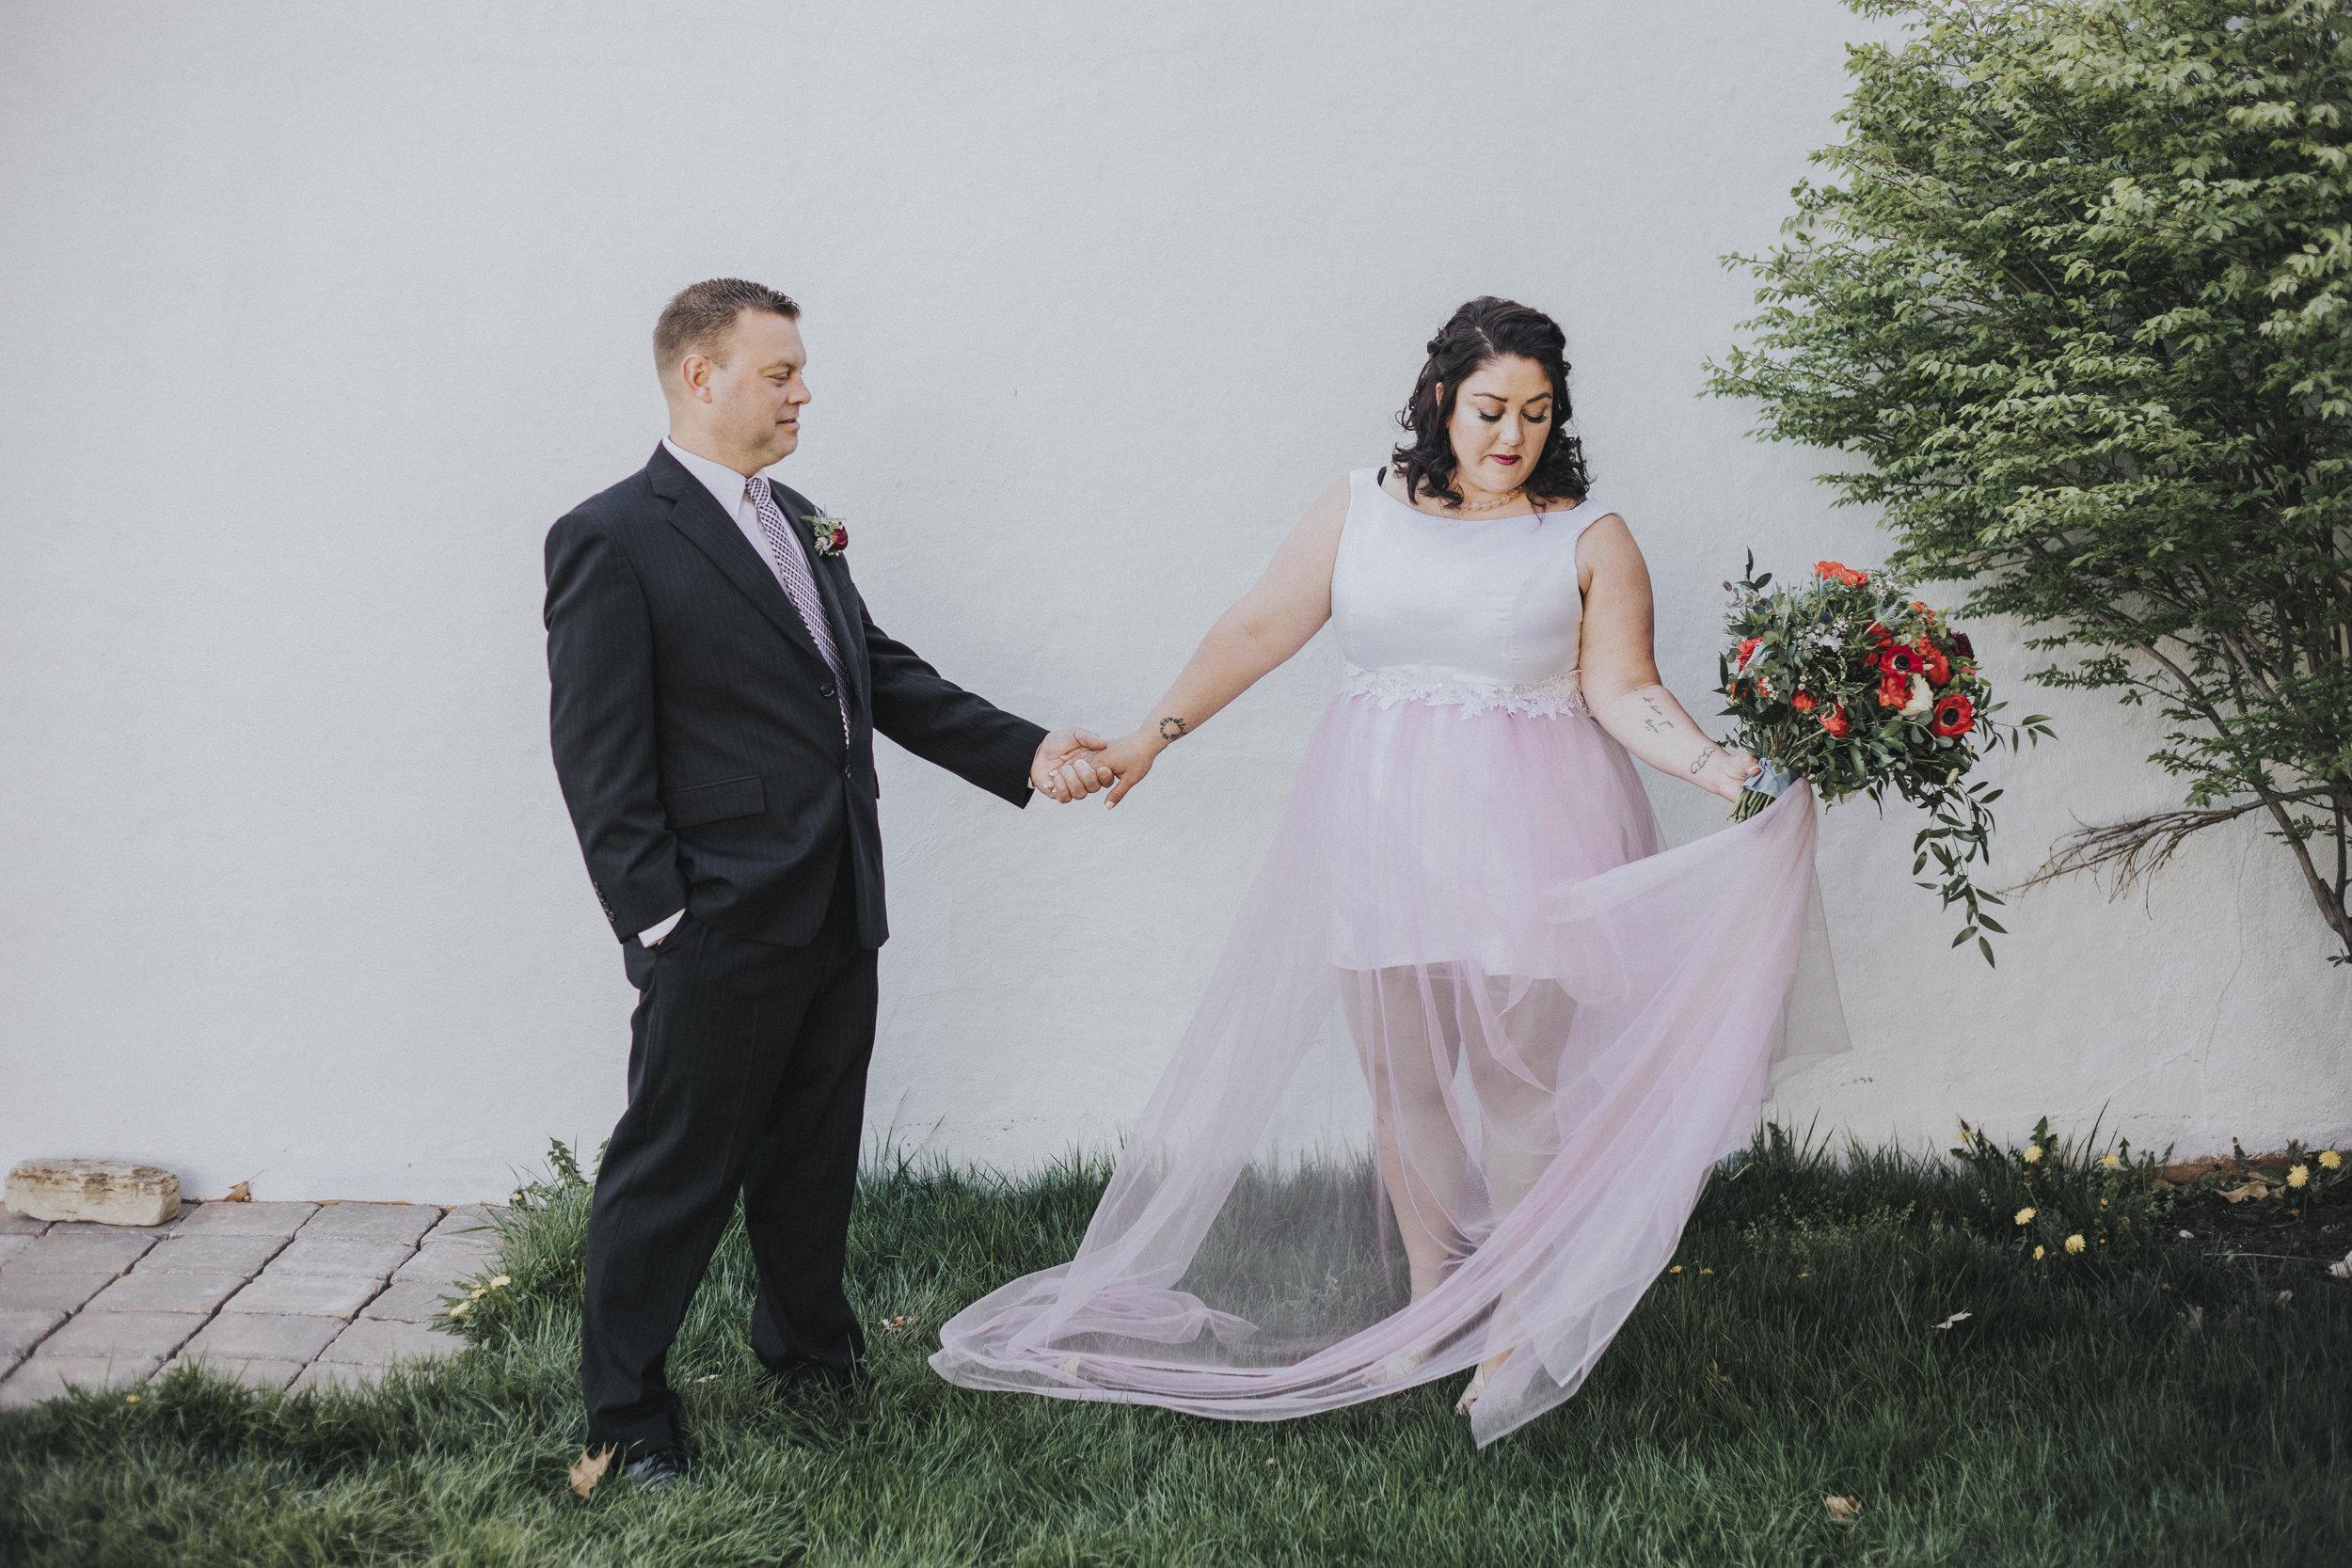 50 midwest-colorado-nebraska-elopement-photography-gretna-turtledoves.jpg